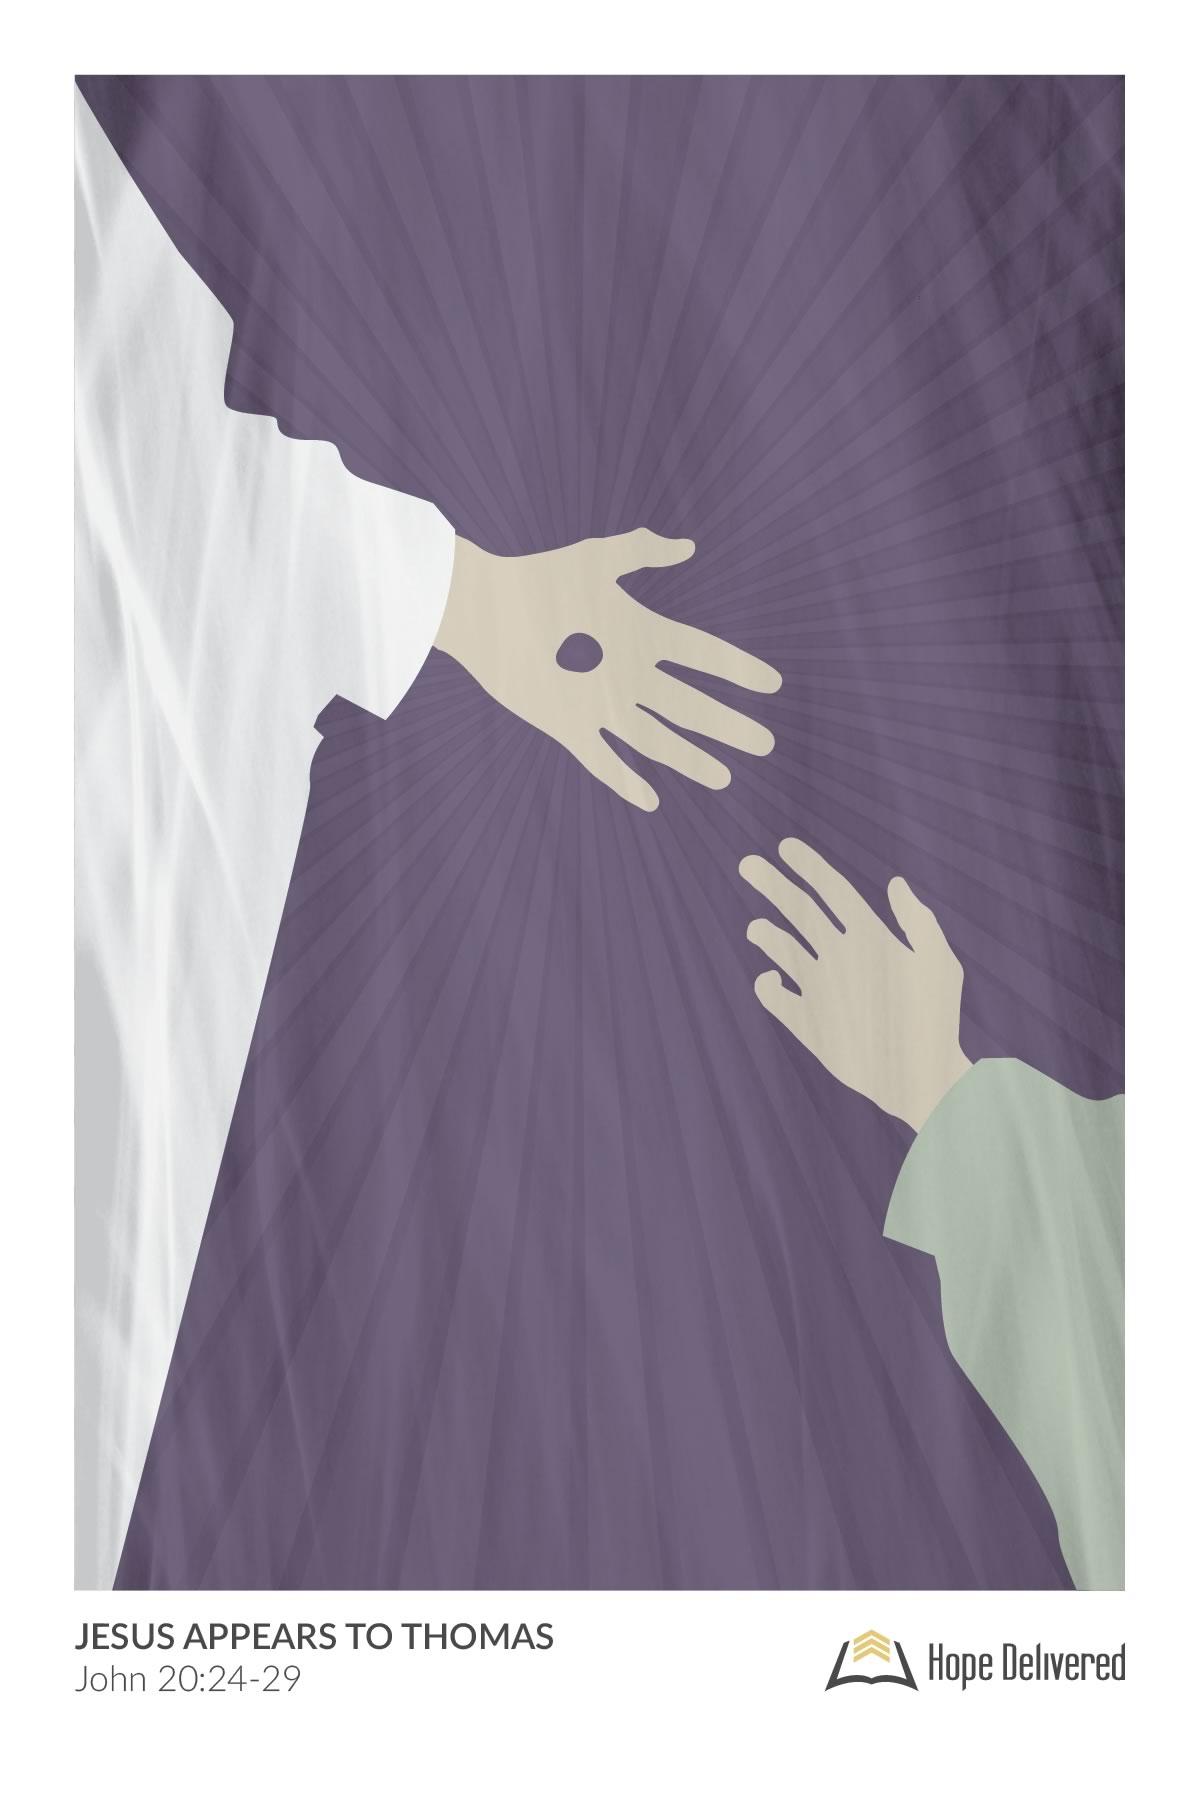 HopeDelivered-ChadLanghoff-ModernBibleArt-ArtPrints-GicleePrint-MinimalistPoster-BibleStory-MinimalistArt-Genesis-FullSeries-MiniPrint-Jesus-Easter-HeIsRisen-Resurrection-ResurrectionofJesus-0005-photo.jpg